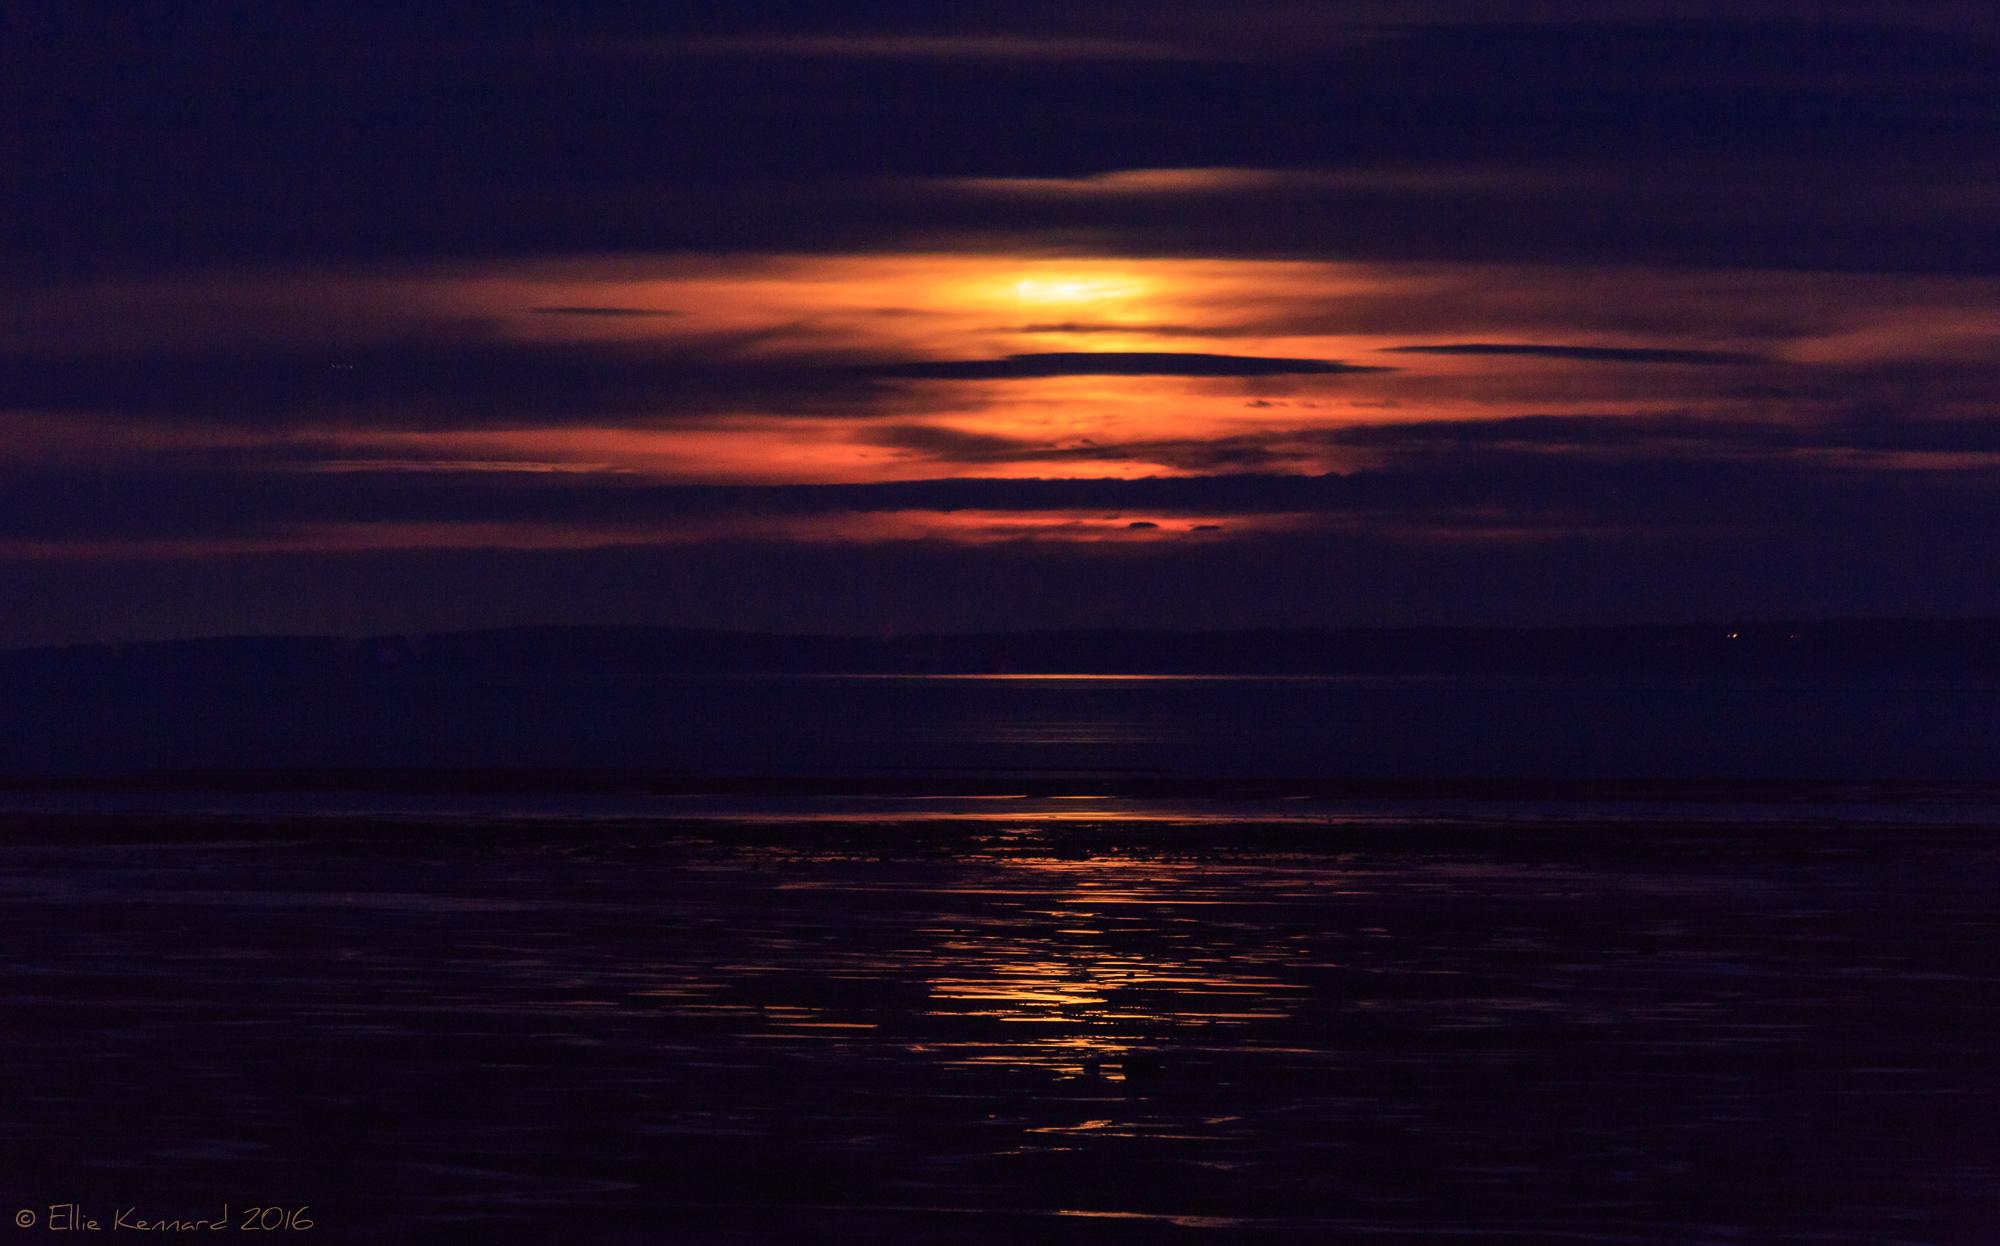 Hunter's Moon Super Moon pursued by a cloud - Ellie Kennard 2016